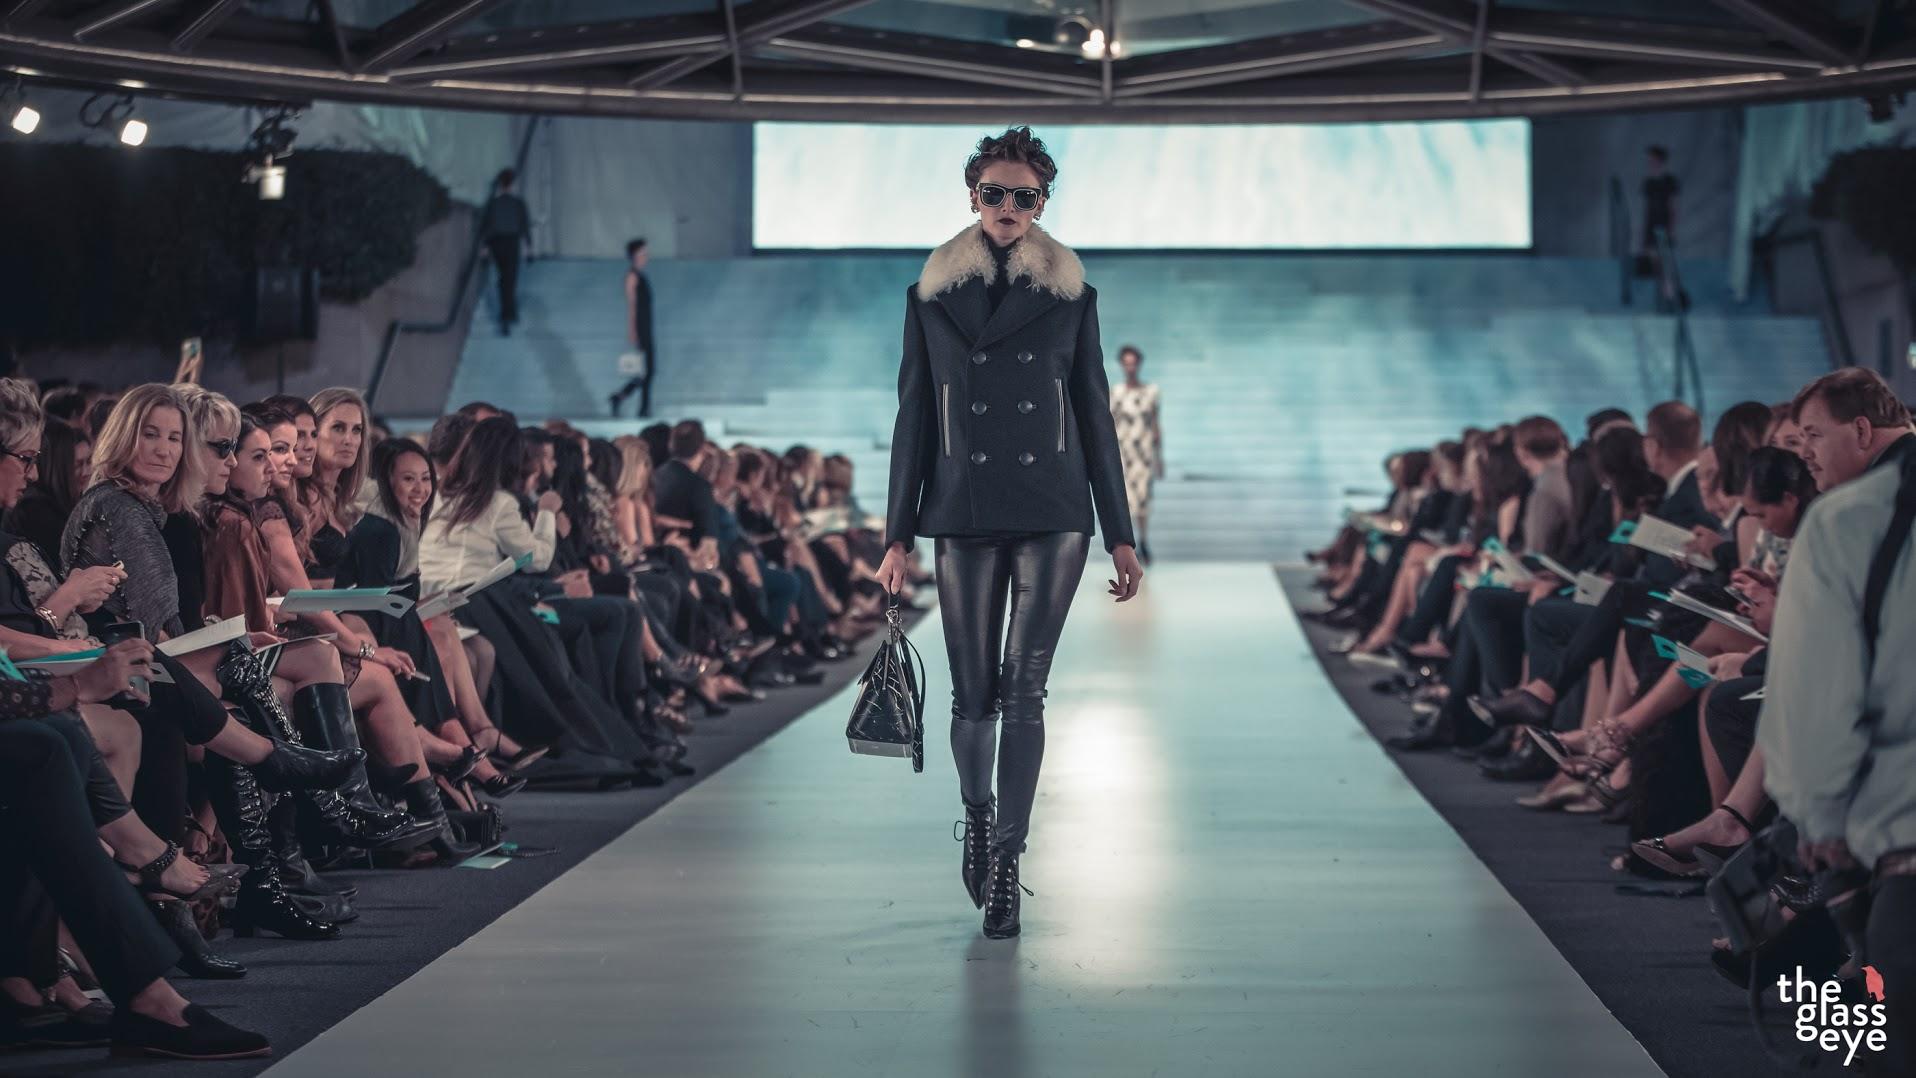 TGE_Nordstrom_FashionShow_VCB-025